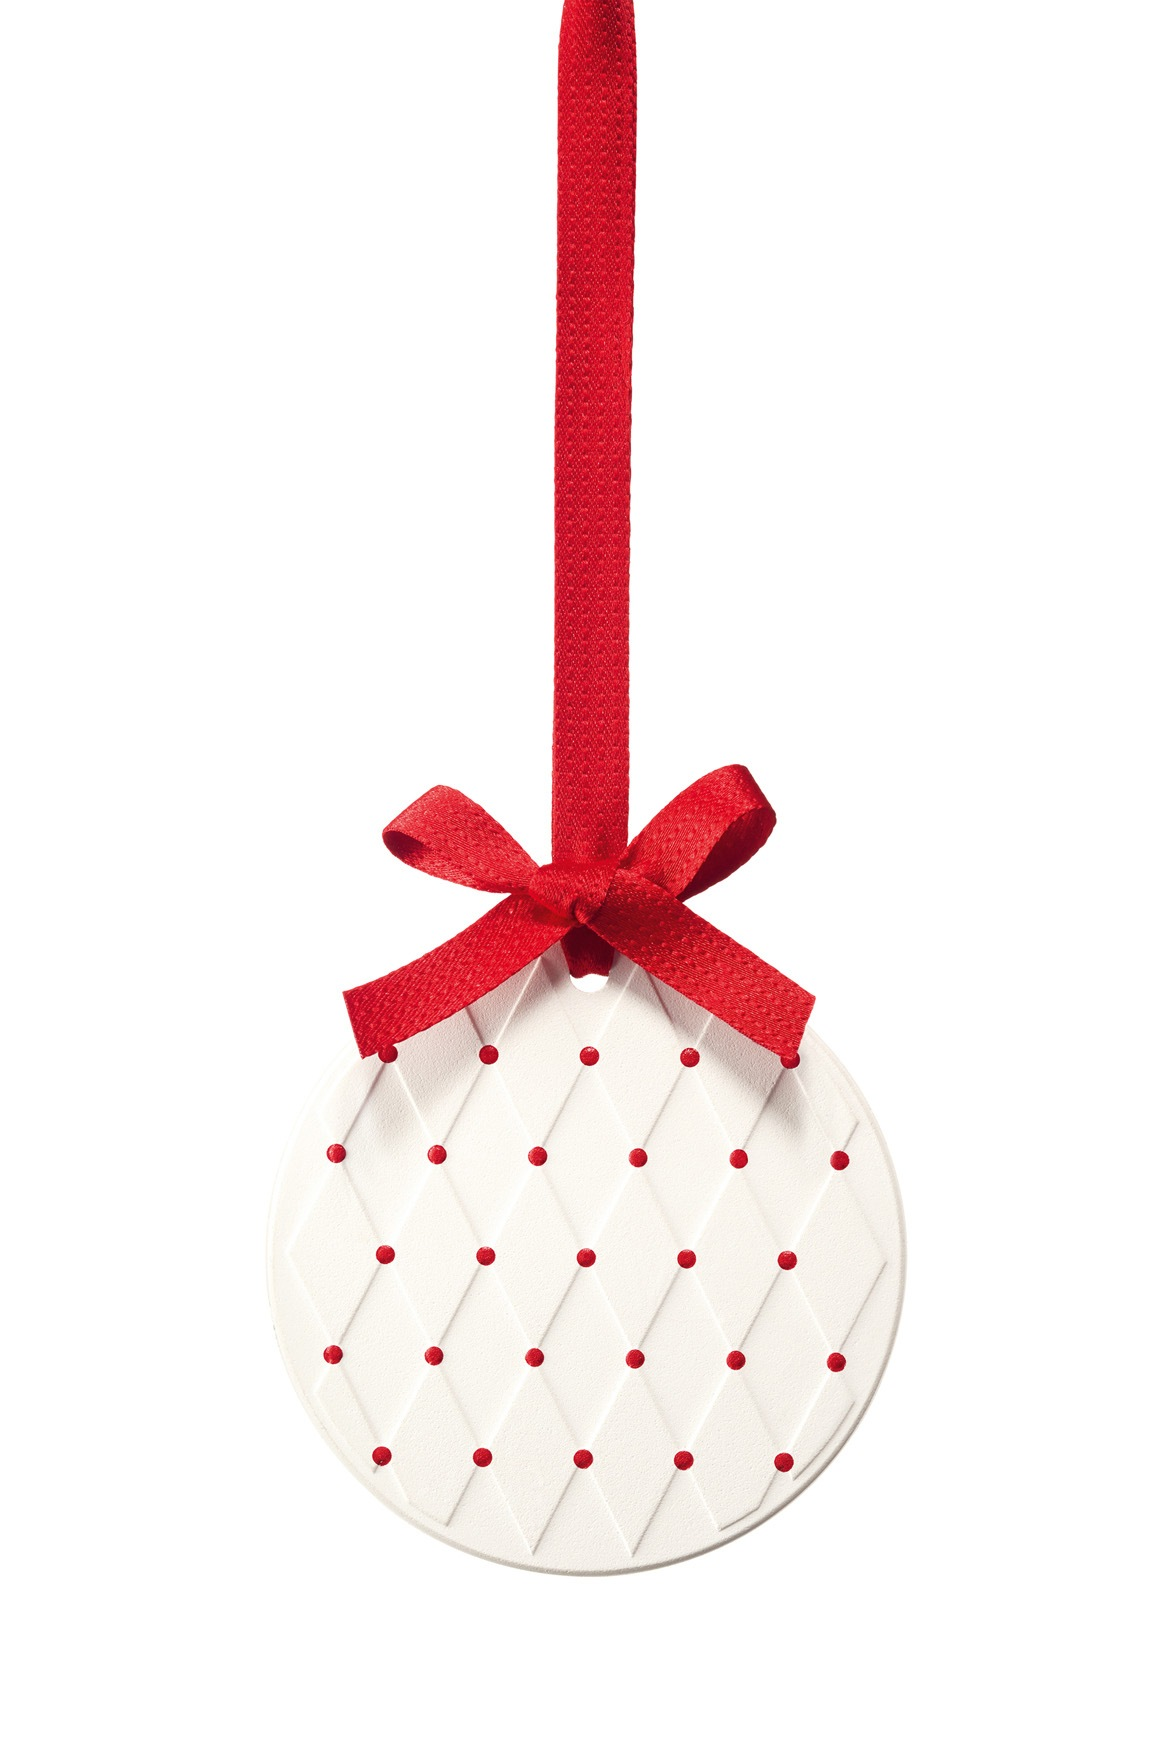 Jo Malone London  Scented Ceramic Christmas Ornament  Myer Online